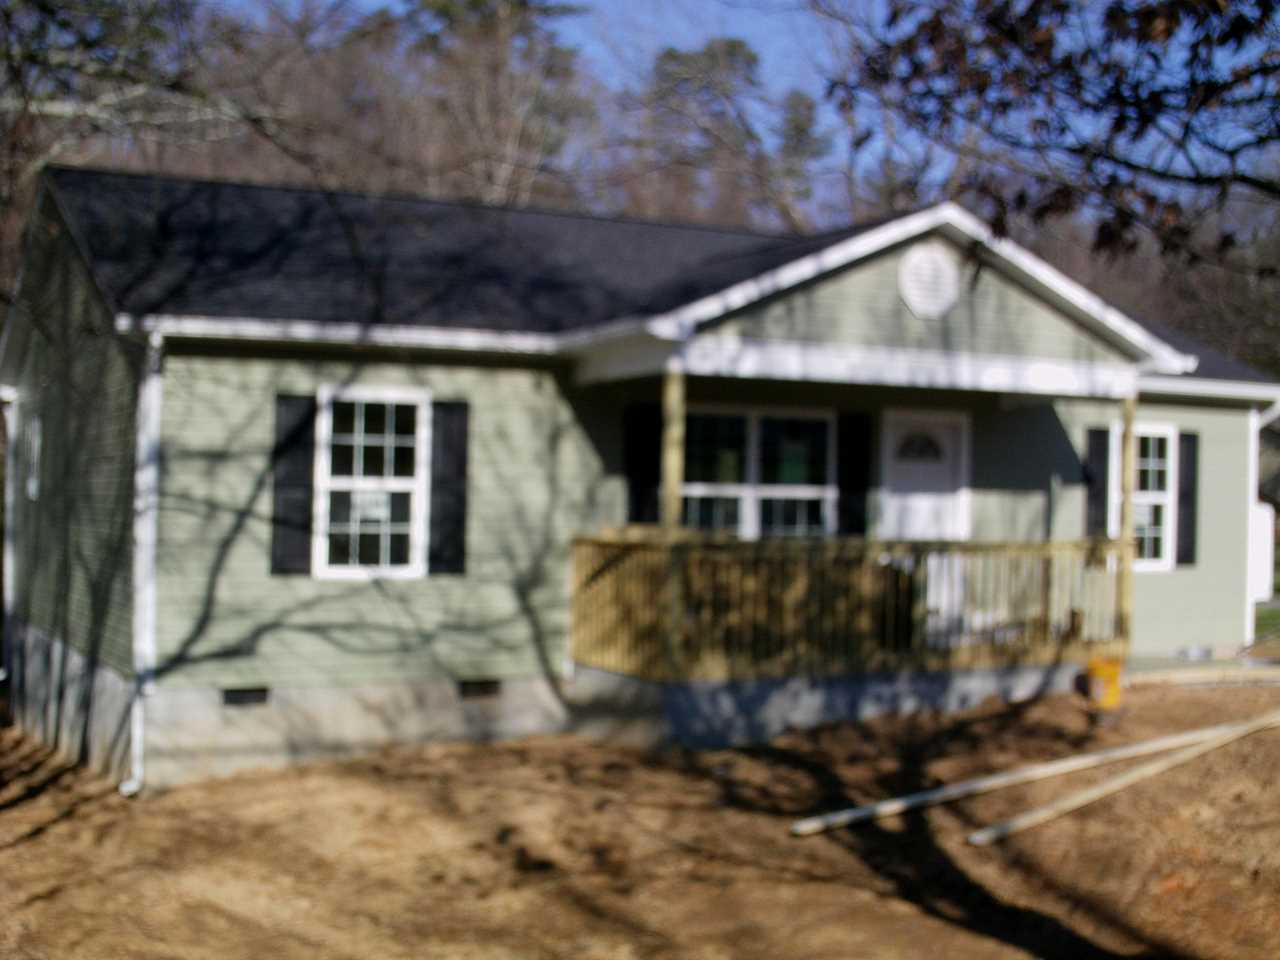 1607 Bradshaw Gardens Dr Knoxville, TN 37912 | MLS 1073104 Photo 1